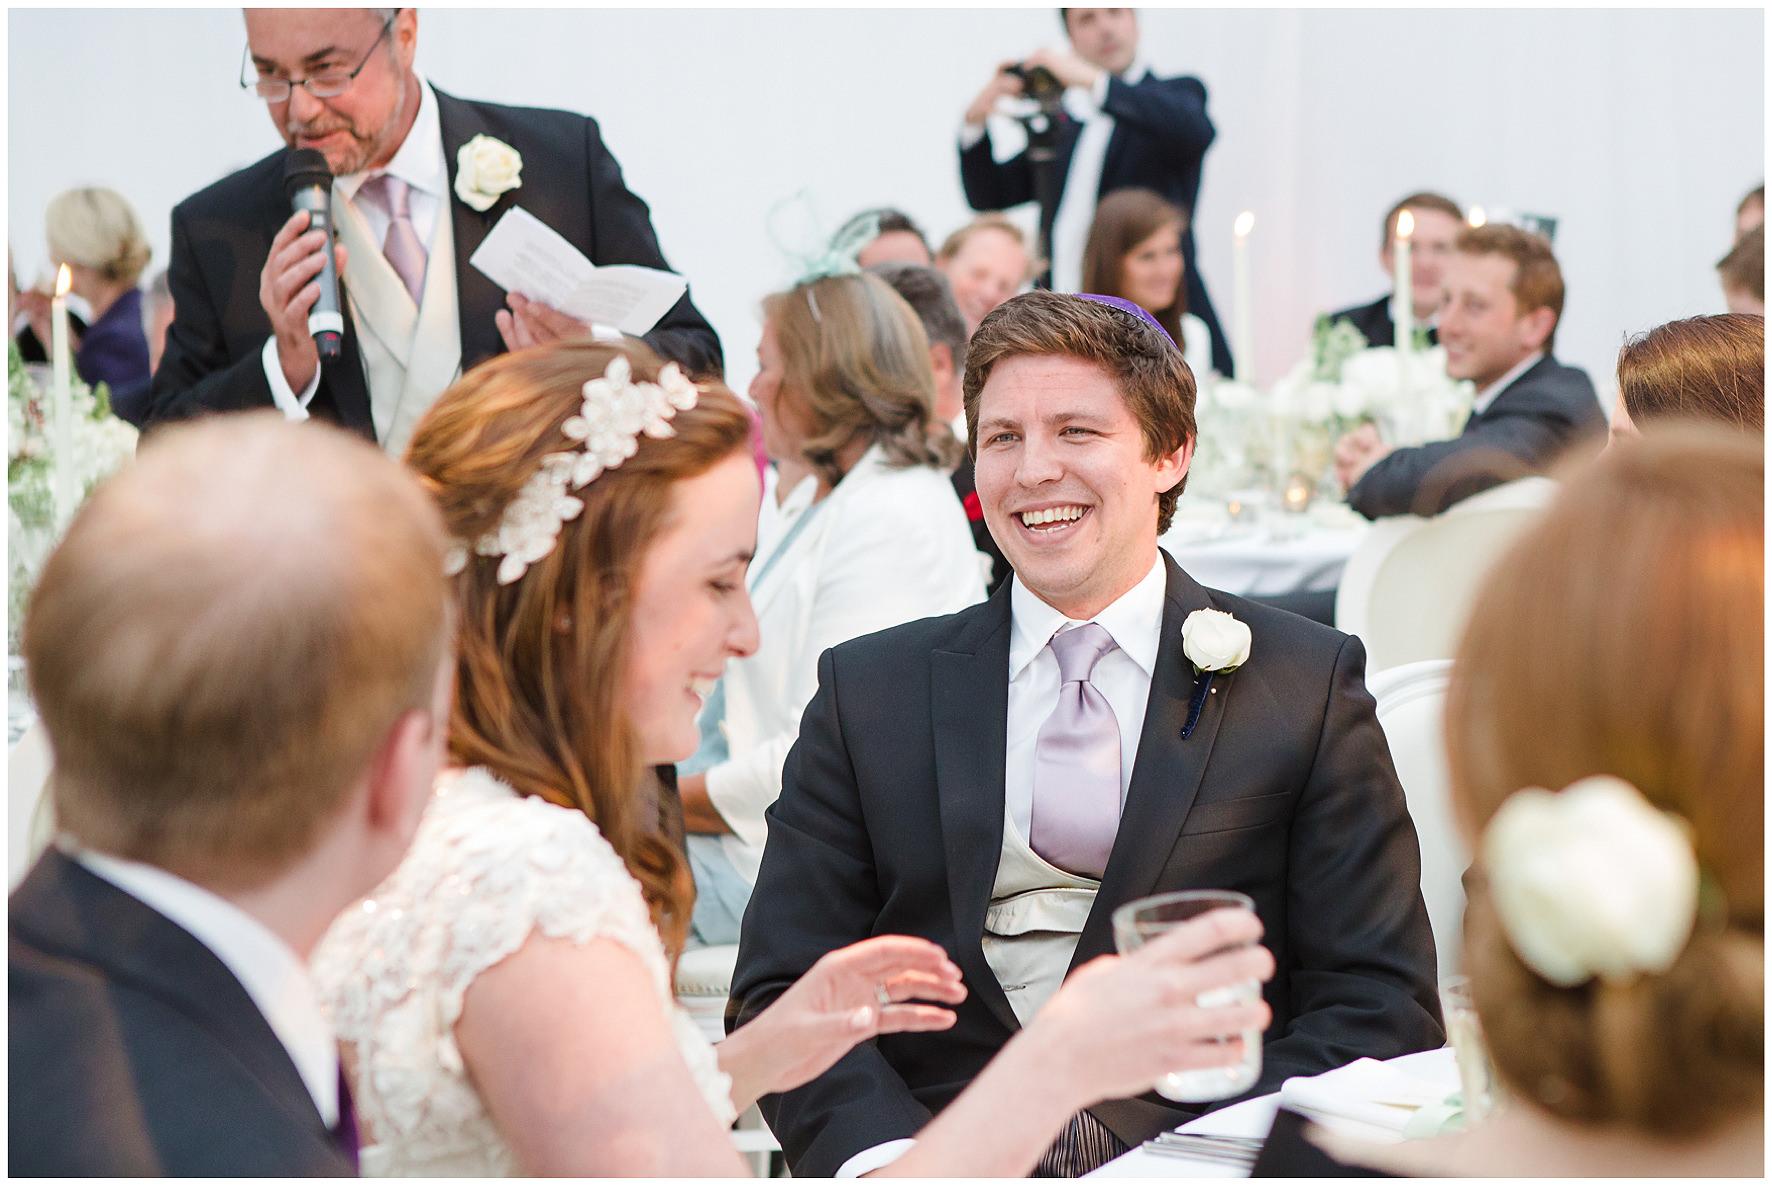 luxury wedding, berkshire, home wedding, wedding breakfast, speeches, Lucy Davenport Photography